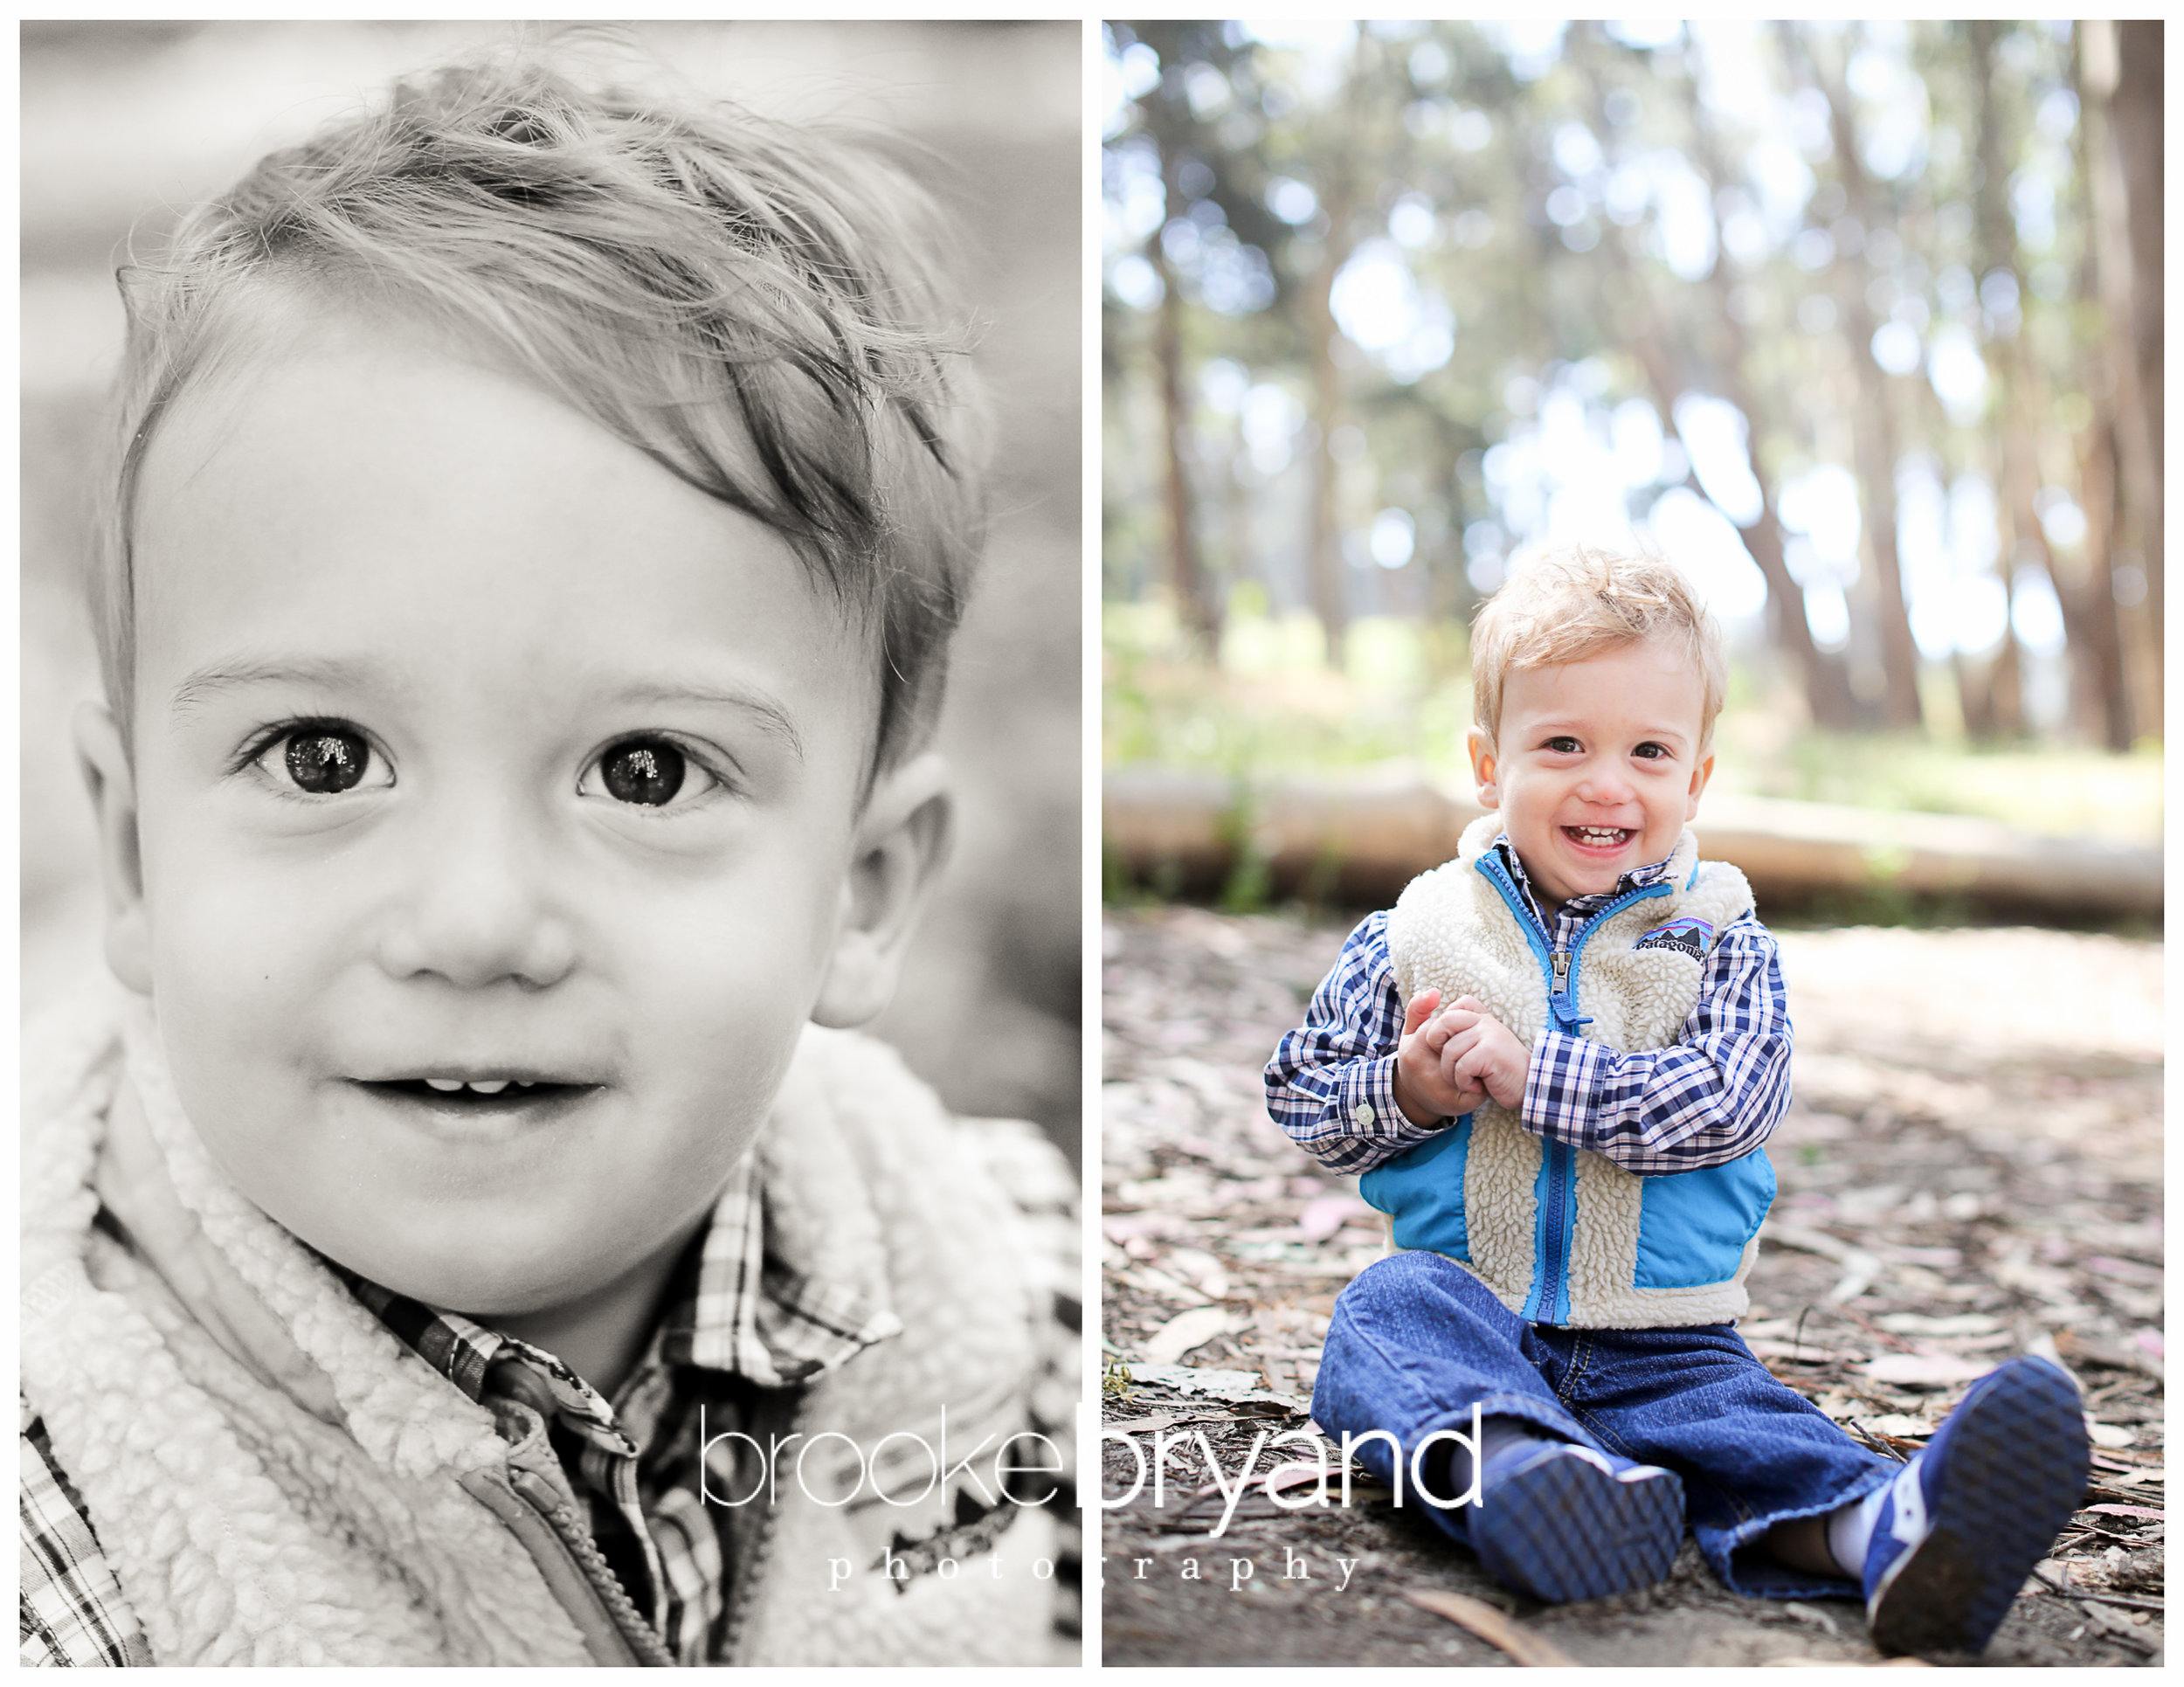 Brooke-Bryand-Photography-Lovers-Lane-San-Francisco-Family-Photographer-2-up-gallo-1.jpg